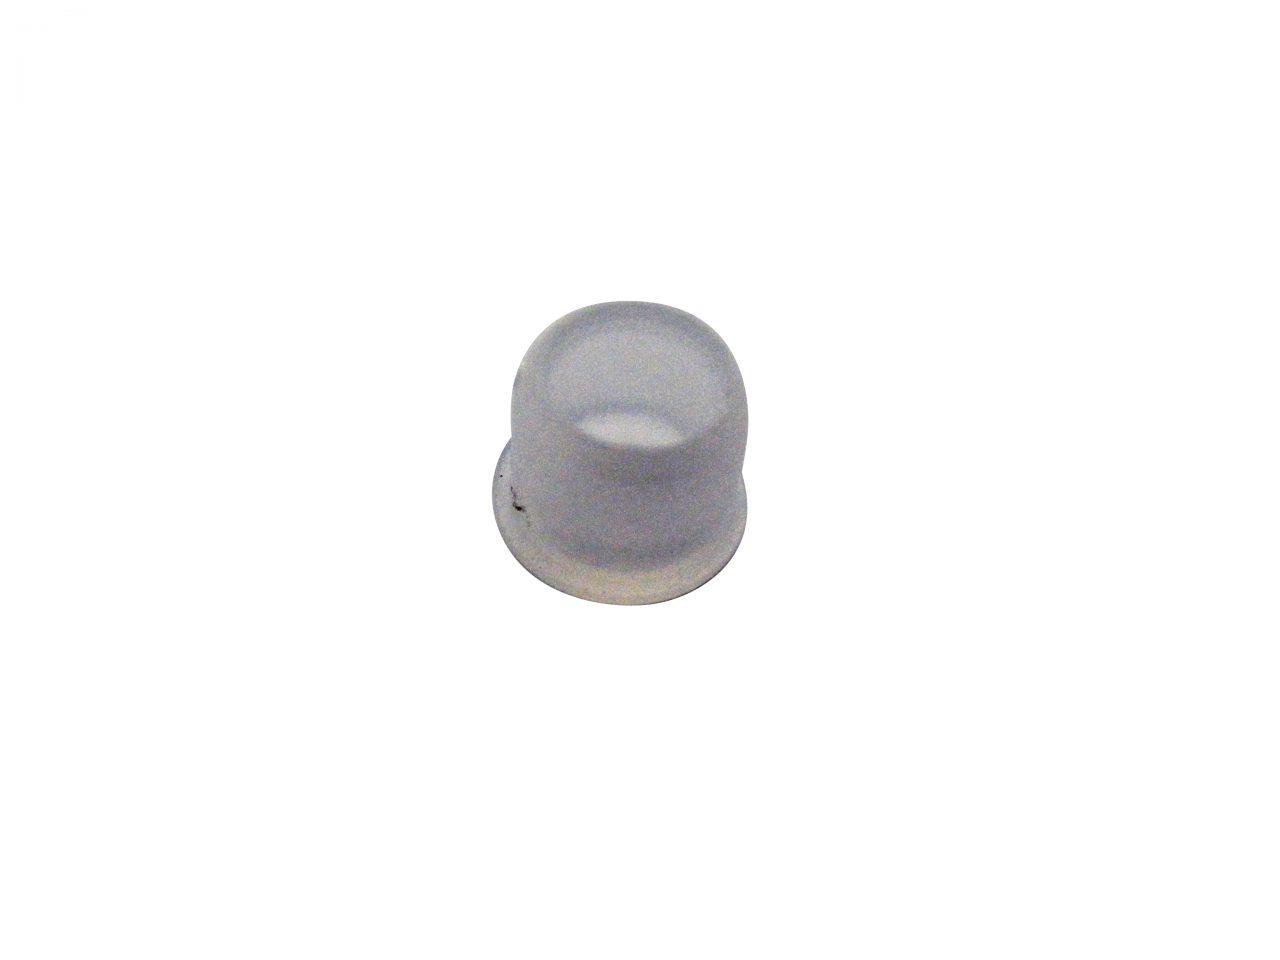 prod-cover-plugs-4.JPG